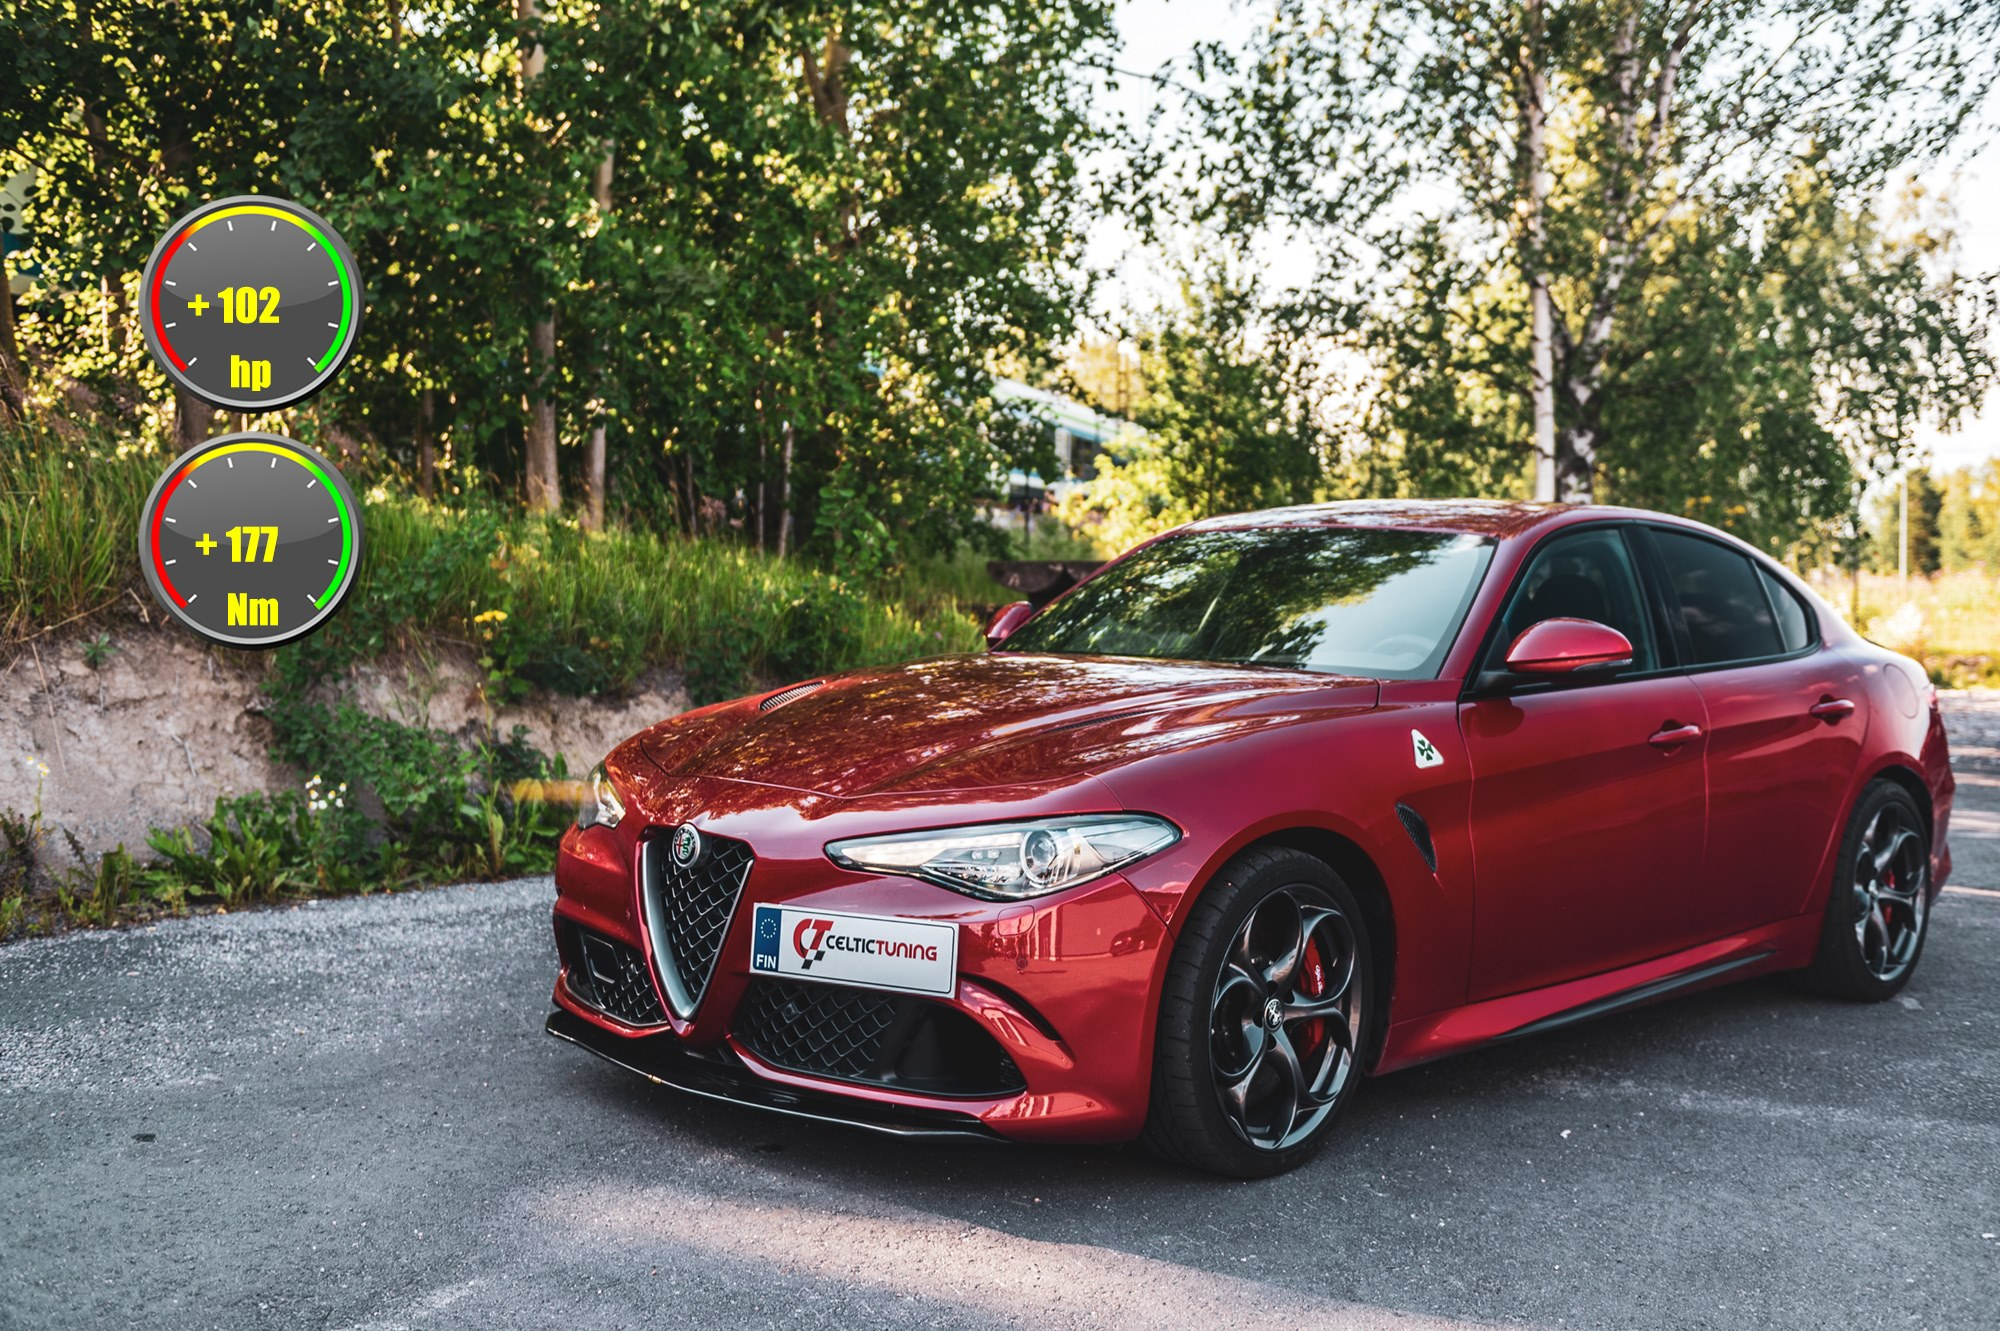 Alfa Romeo Giulia viritys celtic tun